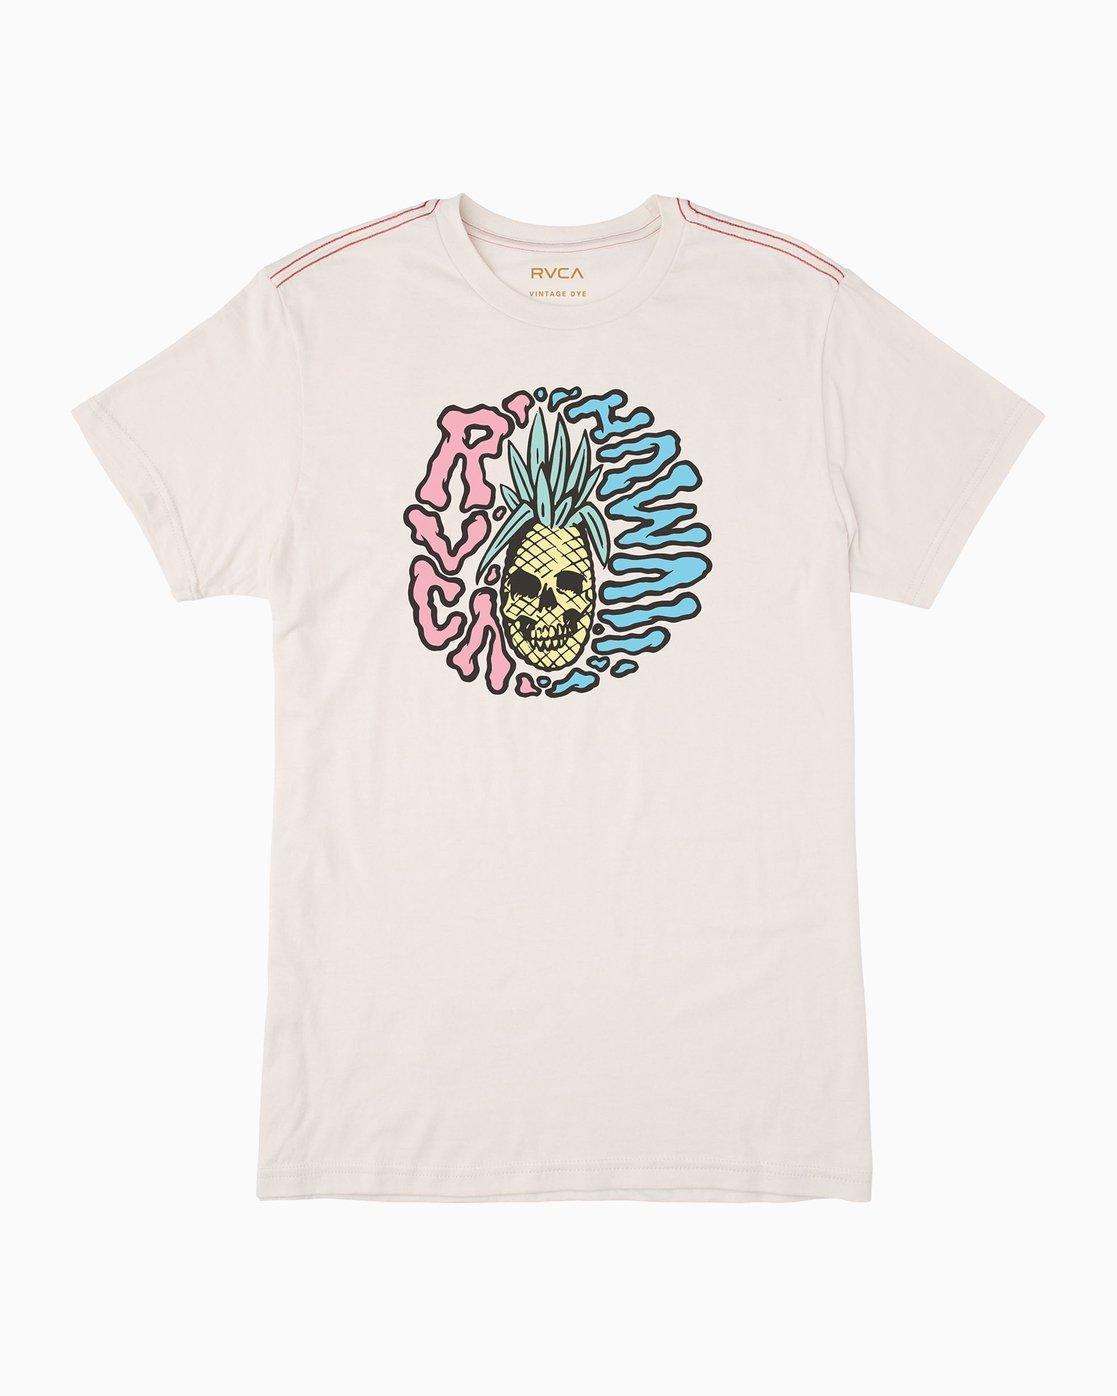 0 Psycho Pino T-Shirt White M420QRPS RVCA